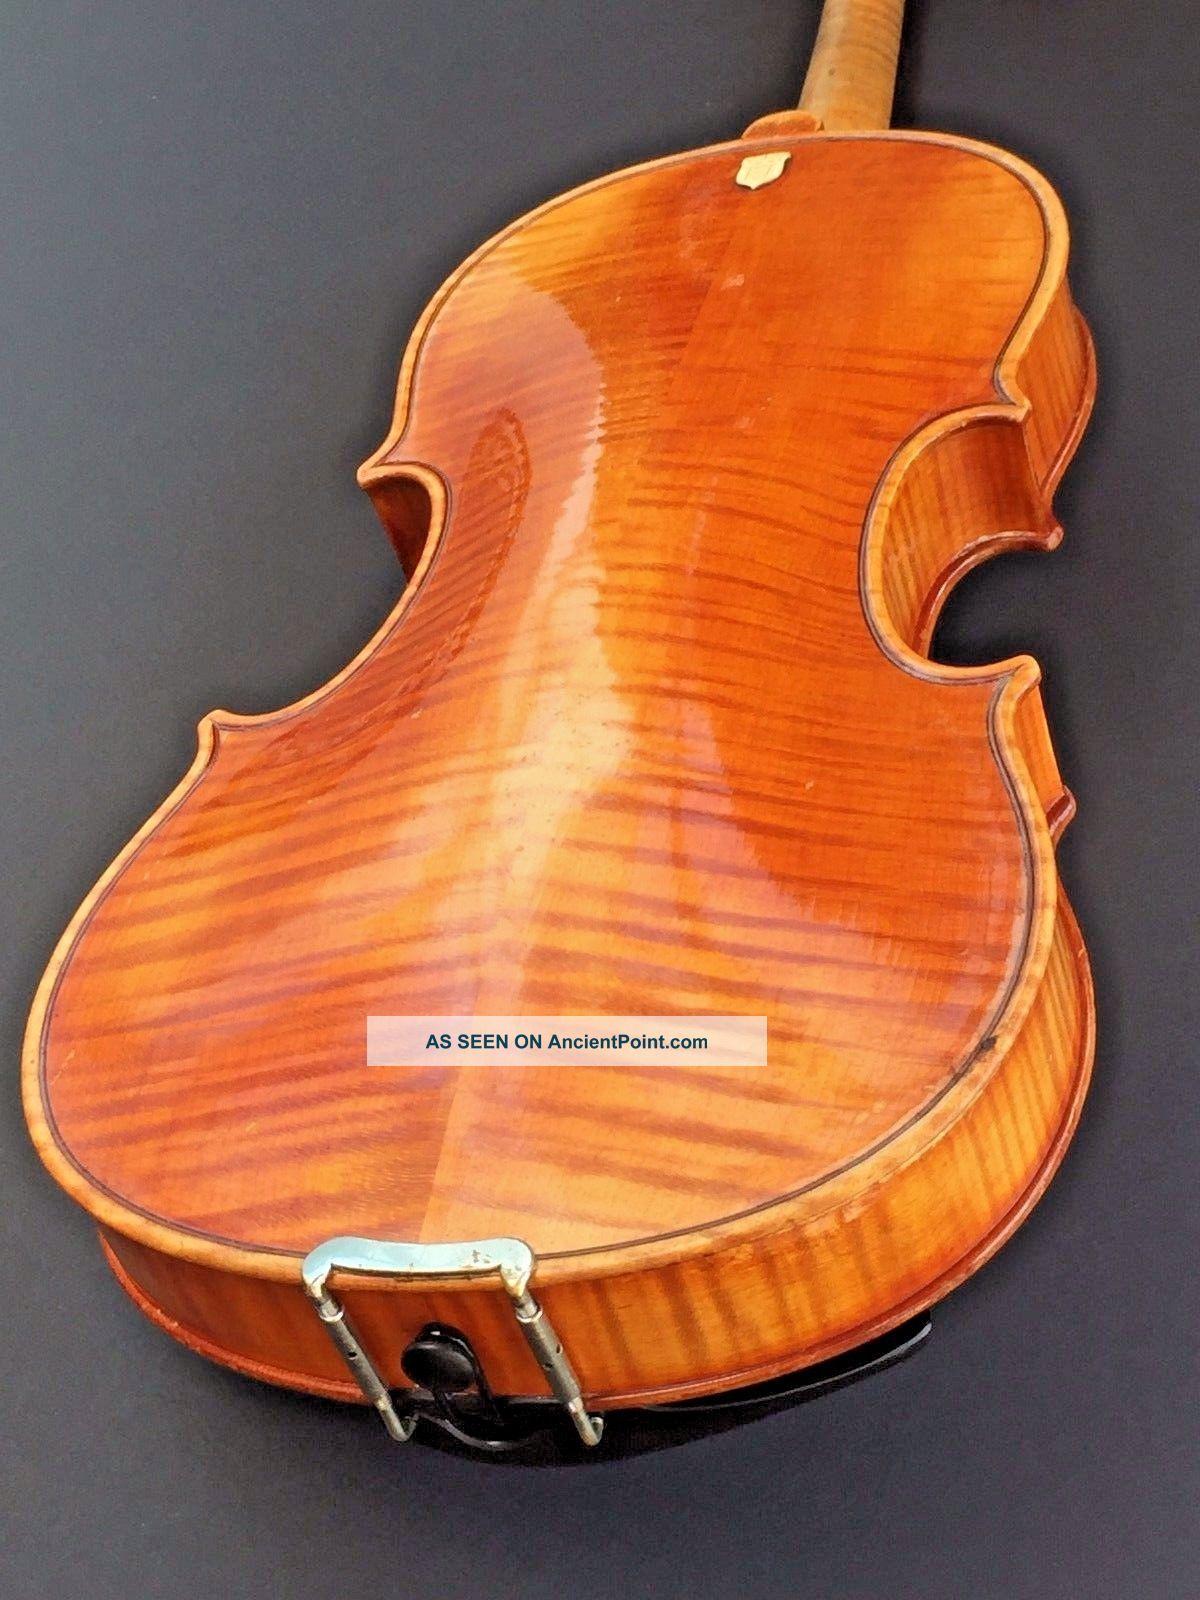 Old 4/4 Violin Flame Back Crest Francesco Ruggieri Detto 1675 Germany String photo